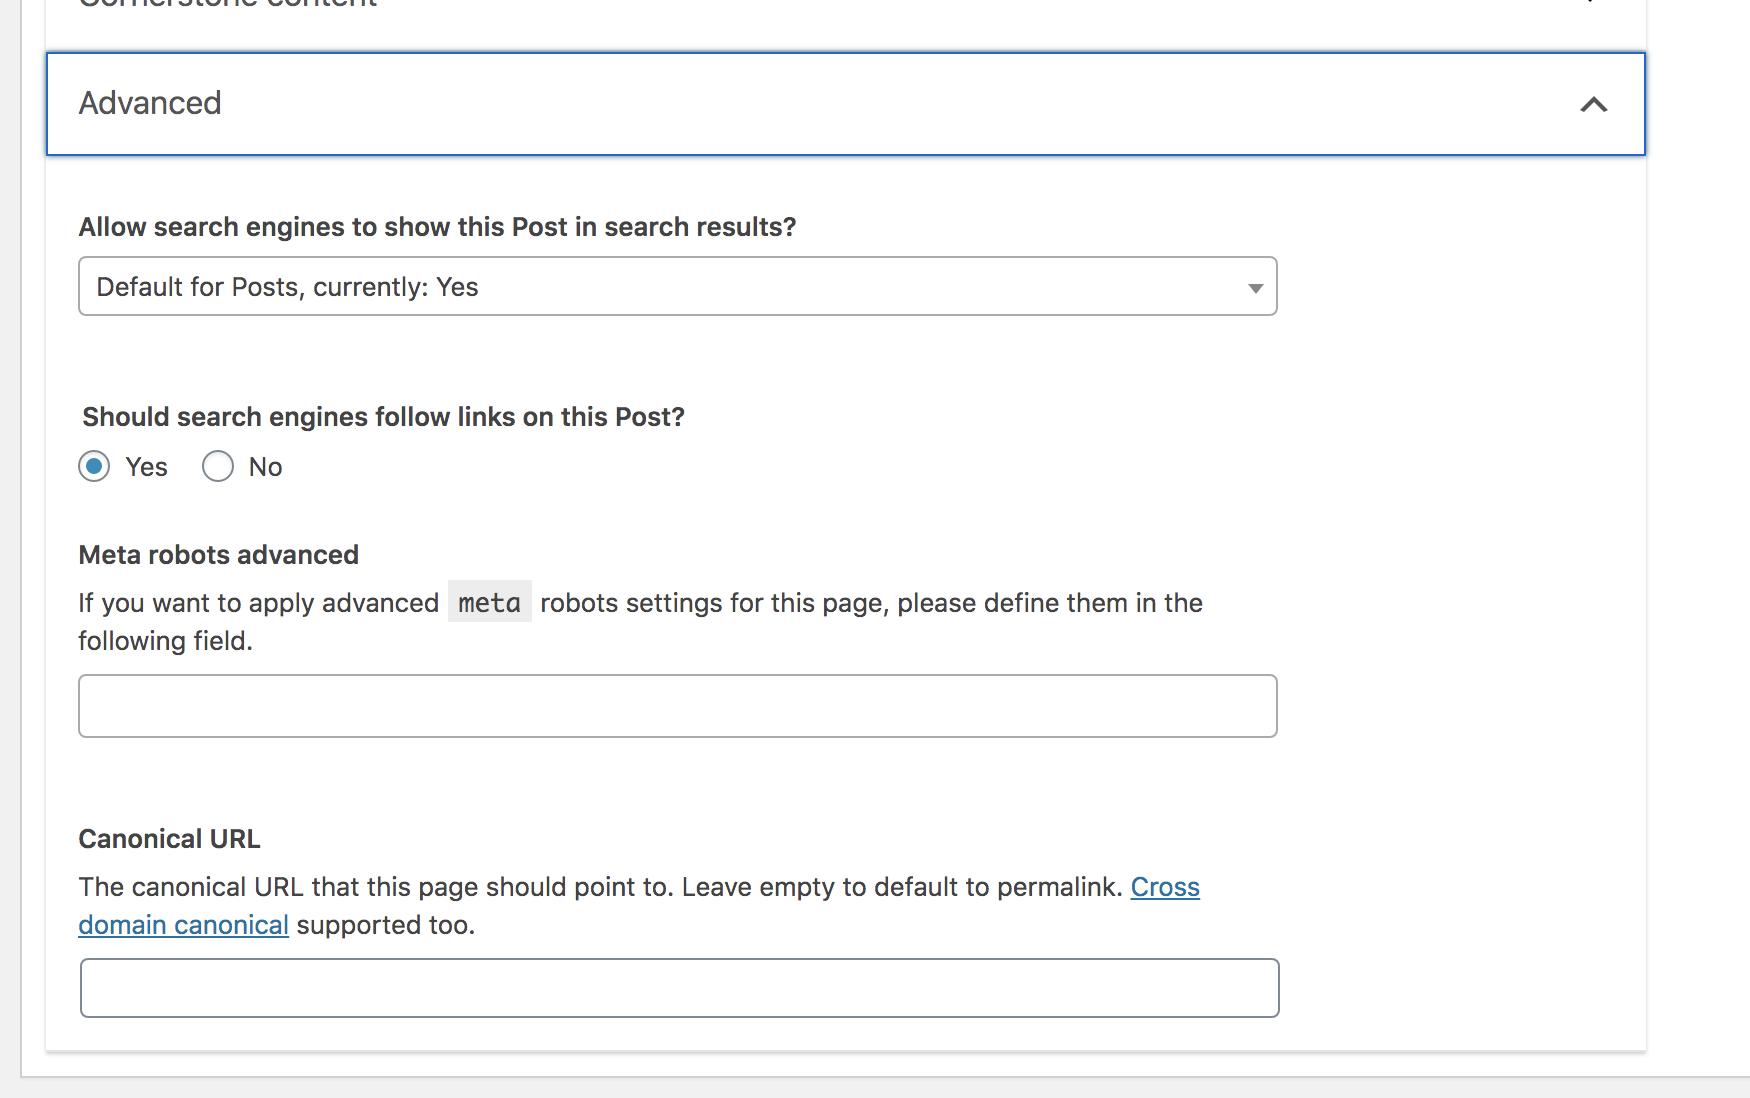 Revealing the fields in the Advanced option on the Yoast SEO WordPress plugin